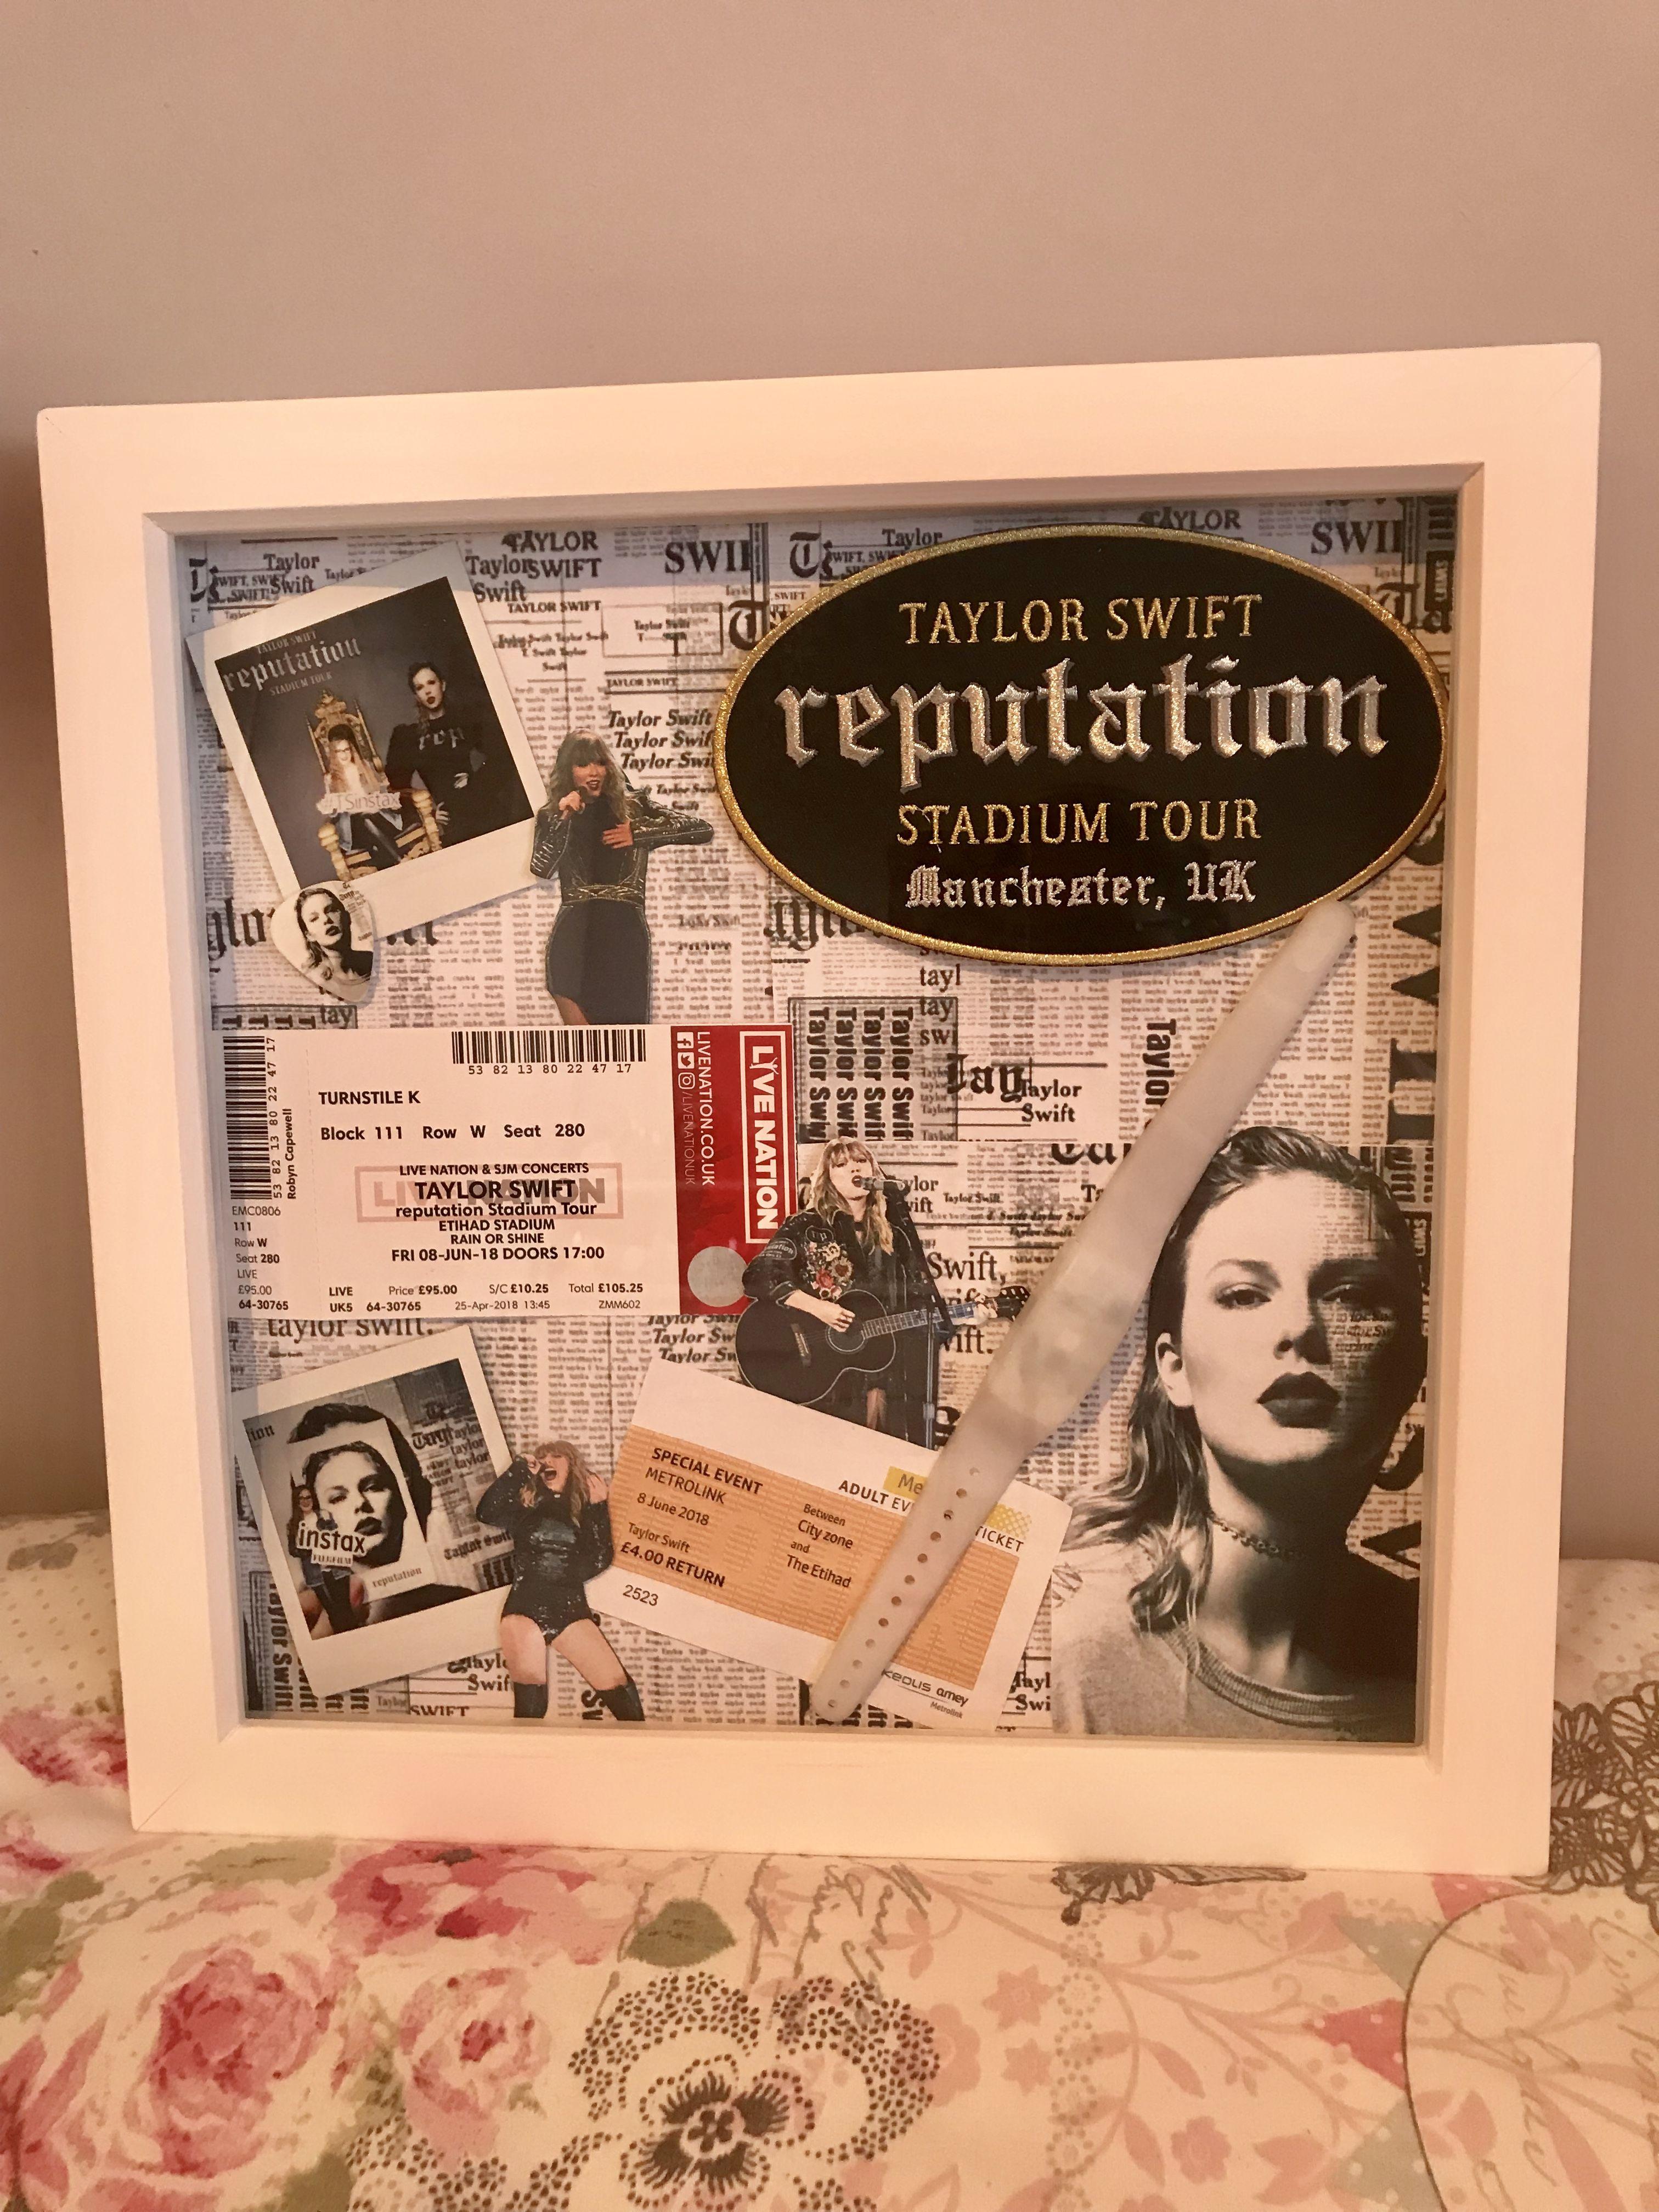 My Taylor Swift Reputation Tour Shadow Box Taylor Swift Fan Taylor Swift Pictures Taylor Swift